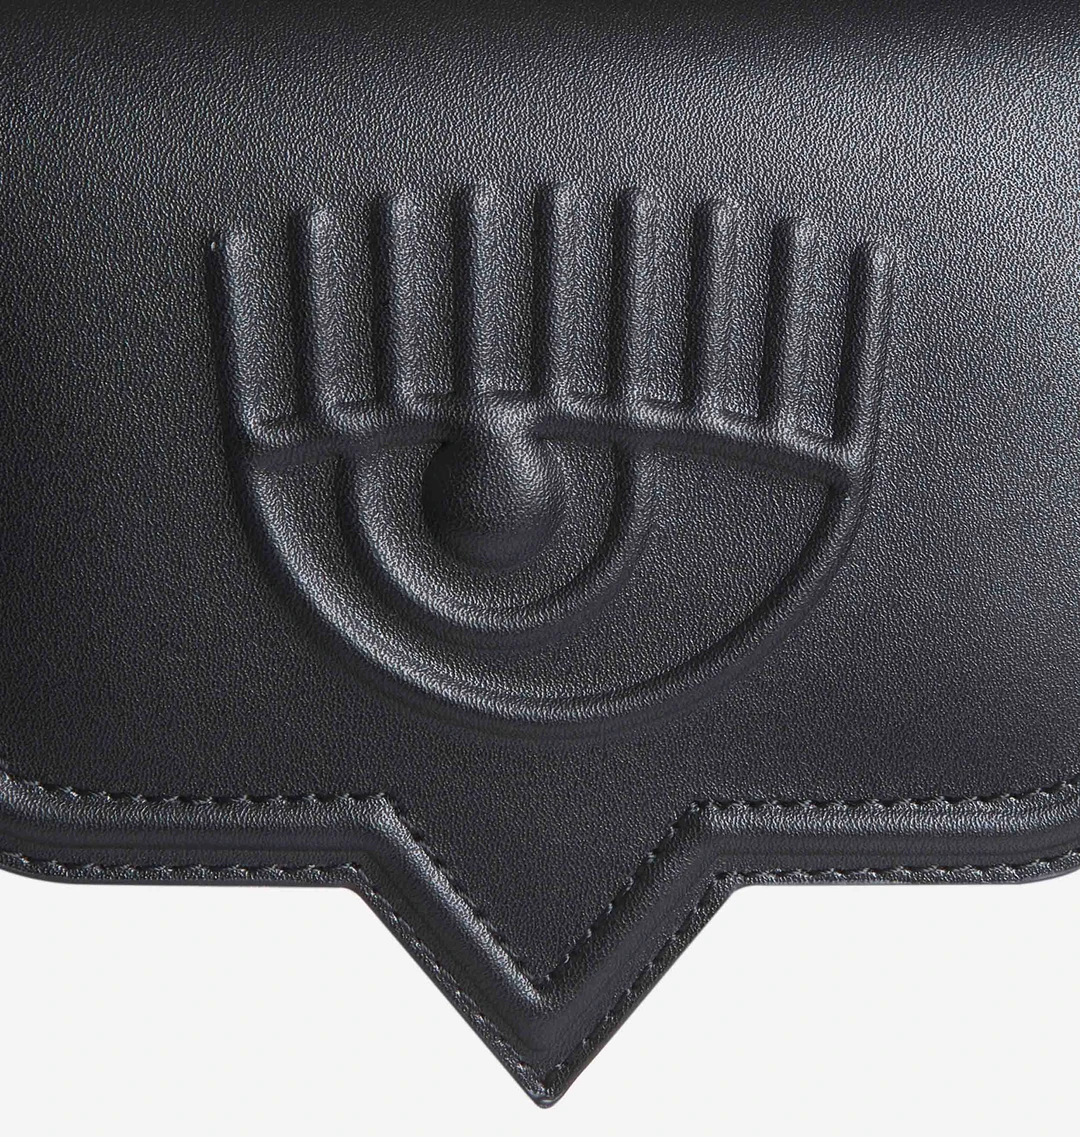 eylike bags mini CHIARA FERRAGNI | 71SB4BA1 ZS132899